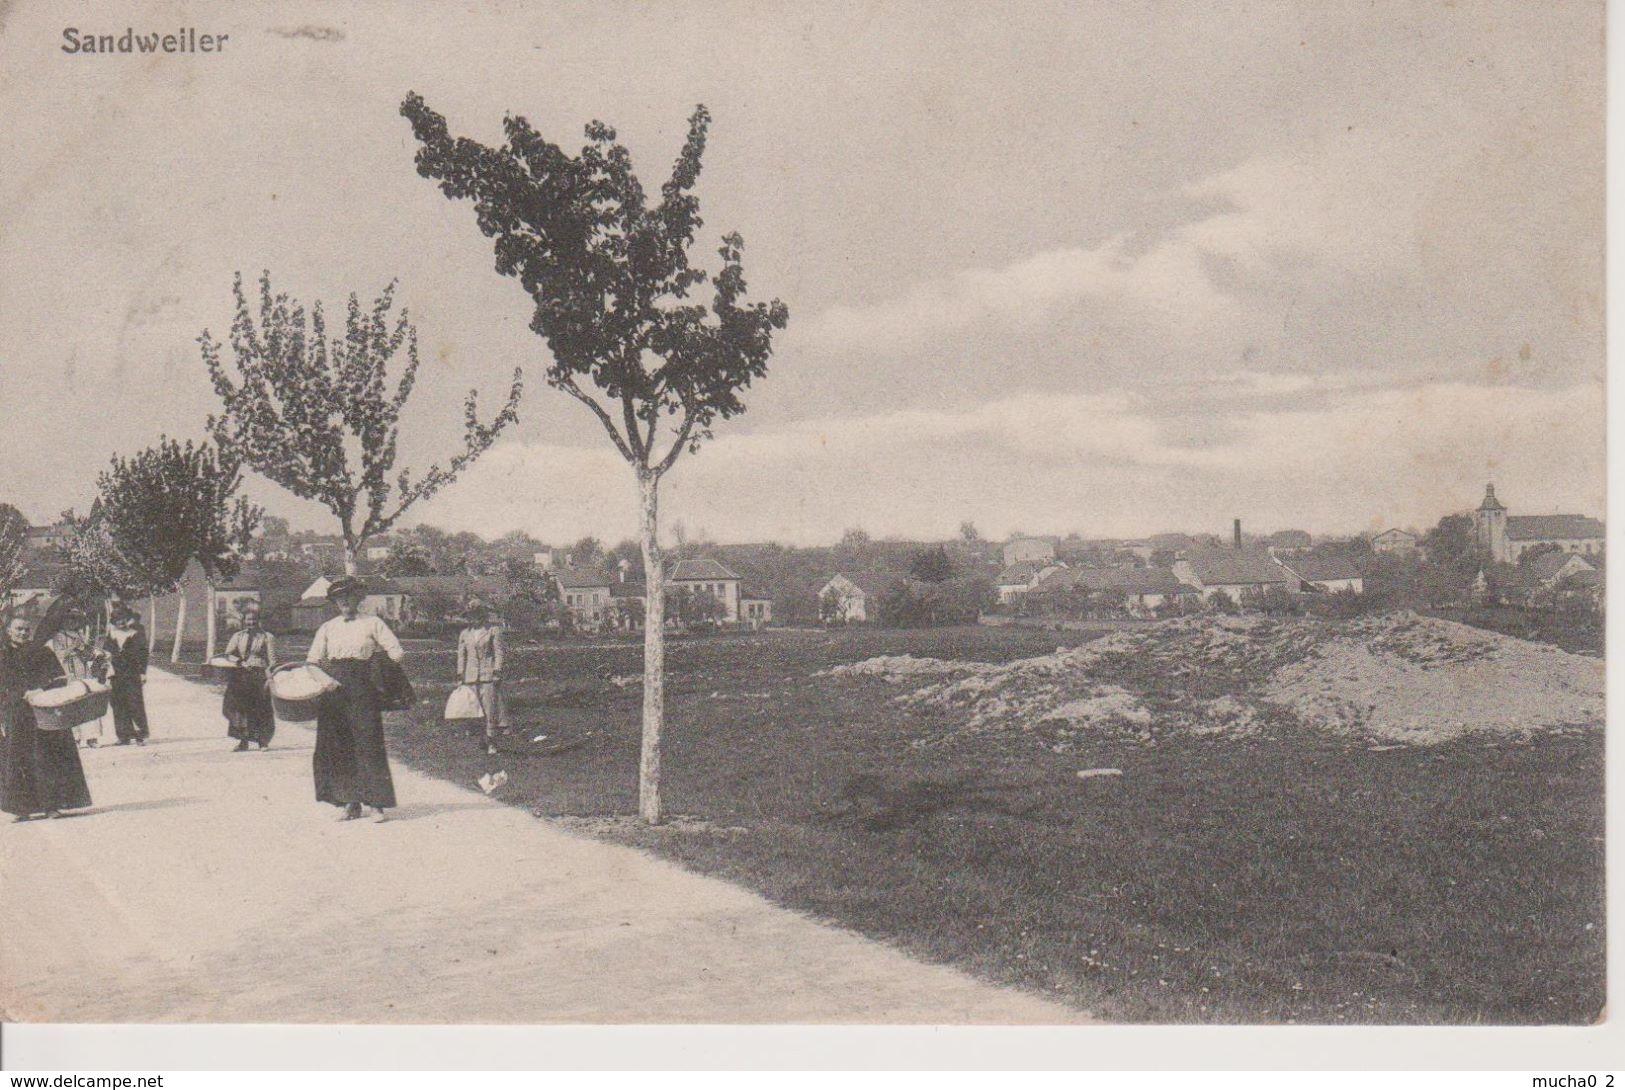 LUXEMBOURG - SANDWEILER - BELLE CARTE - Postcards